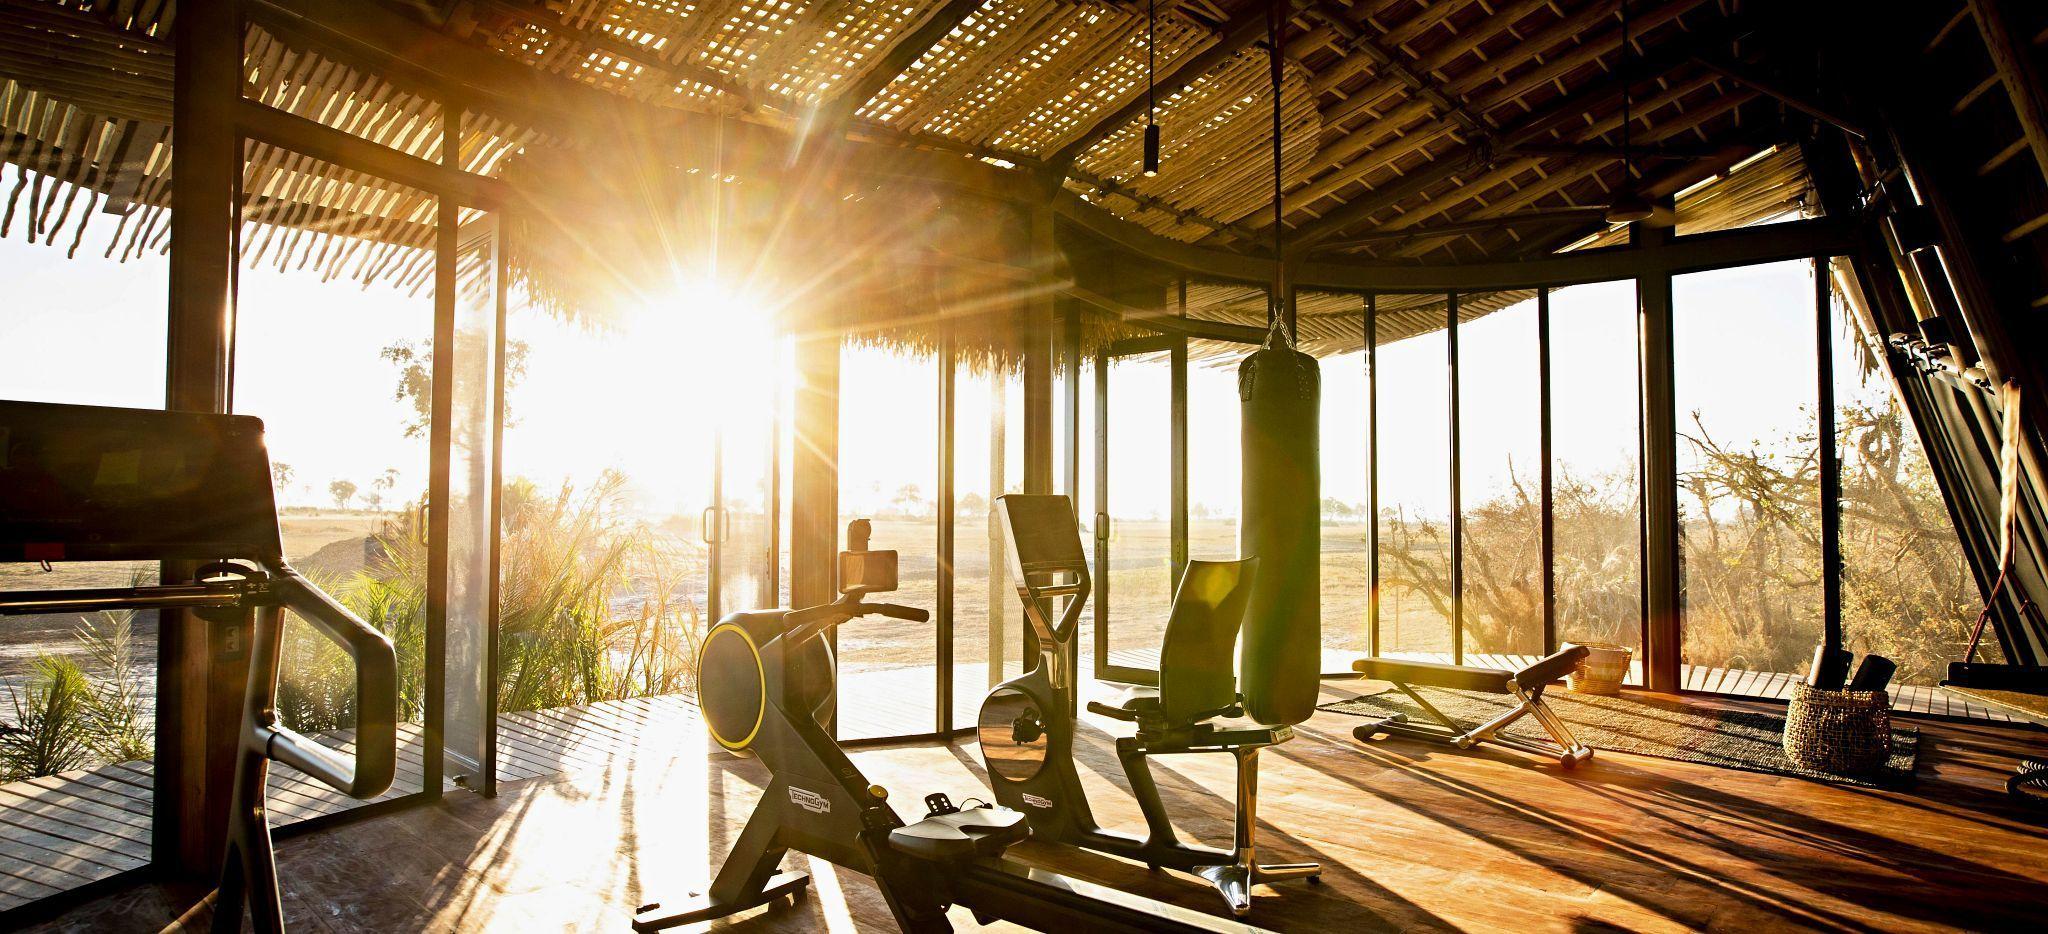 Das Fitnessstudio des Jao Camp, Botsuana